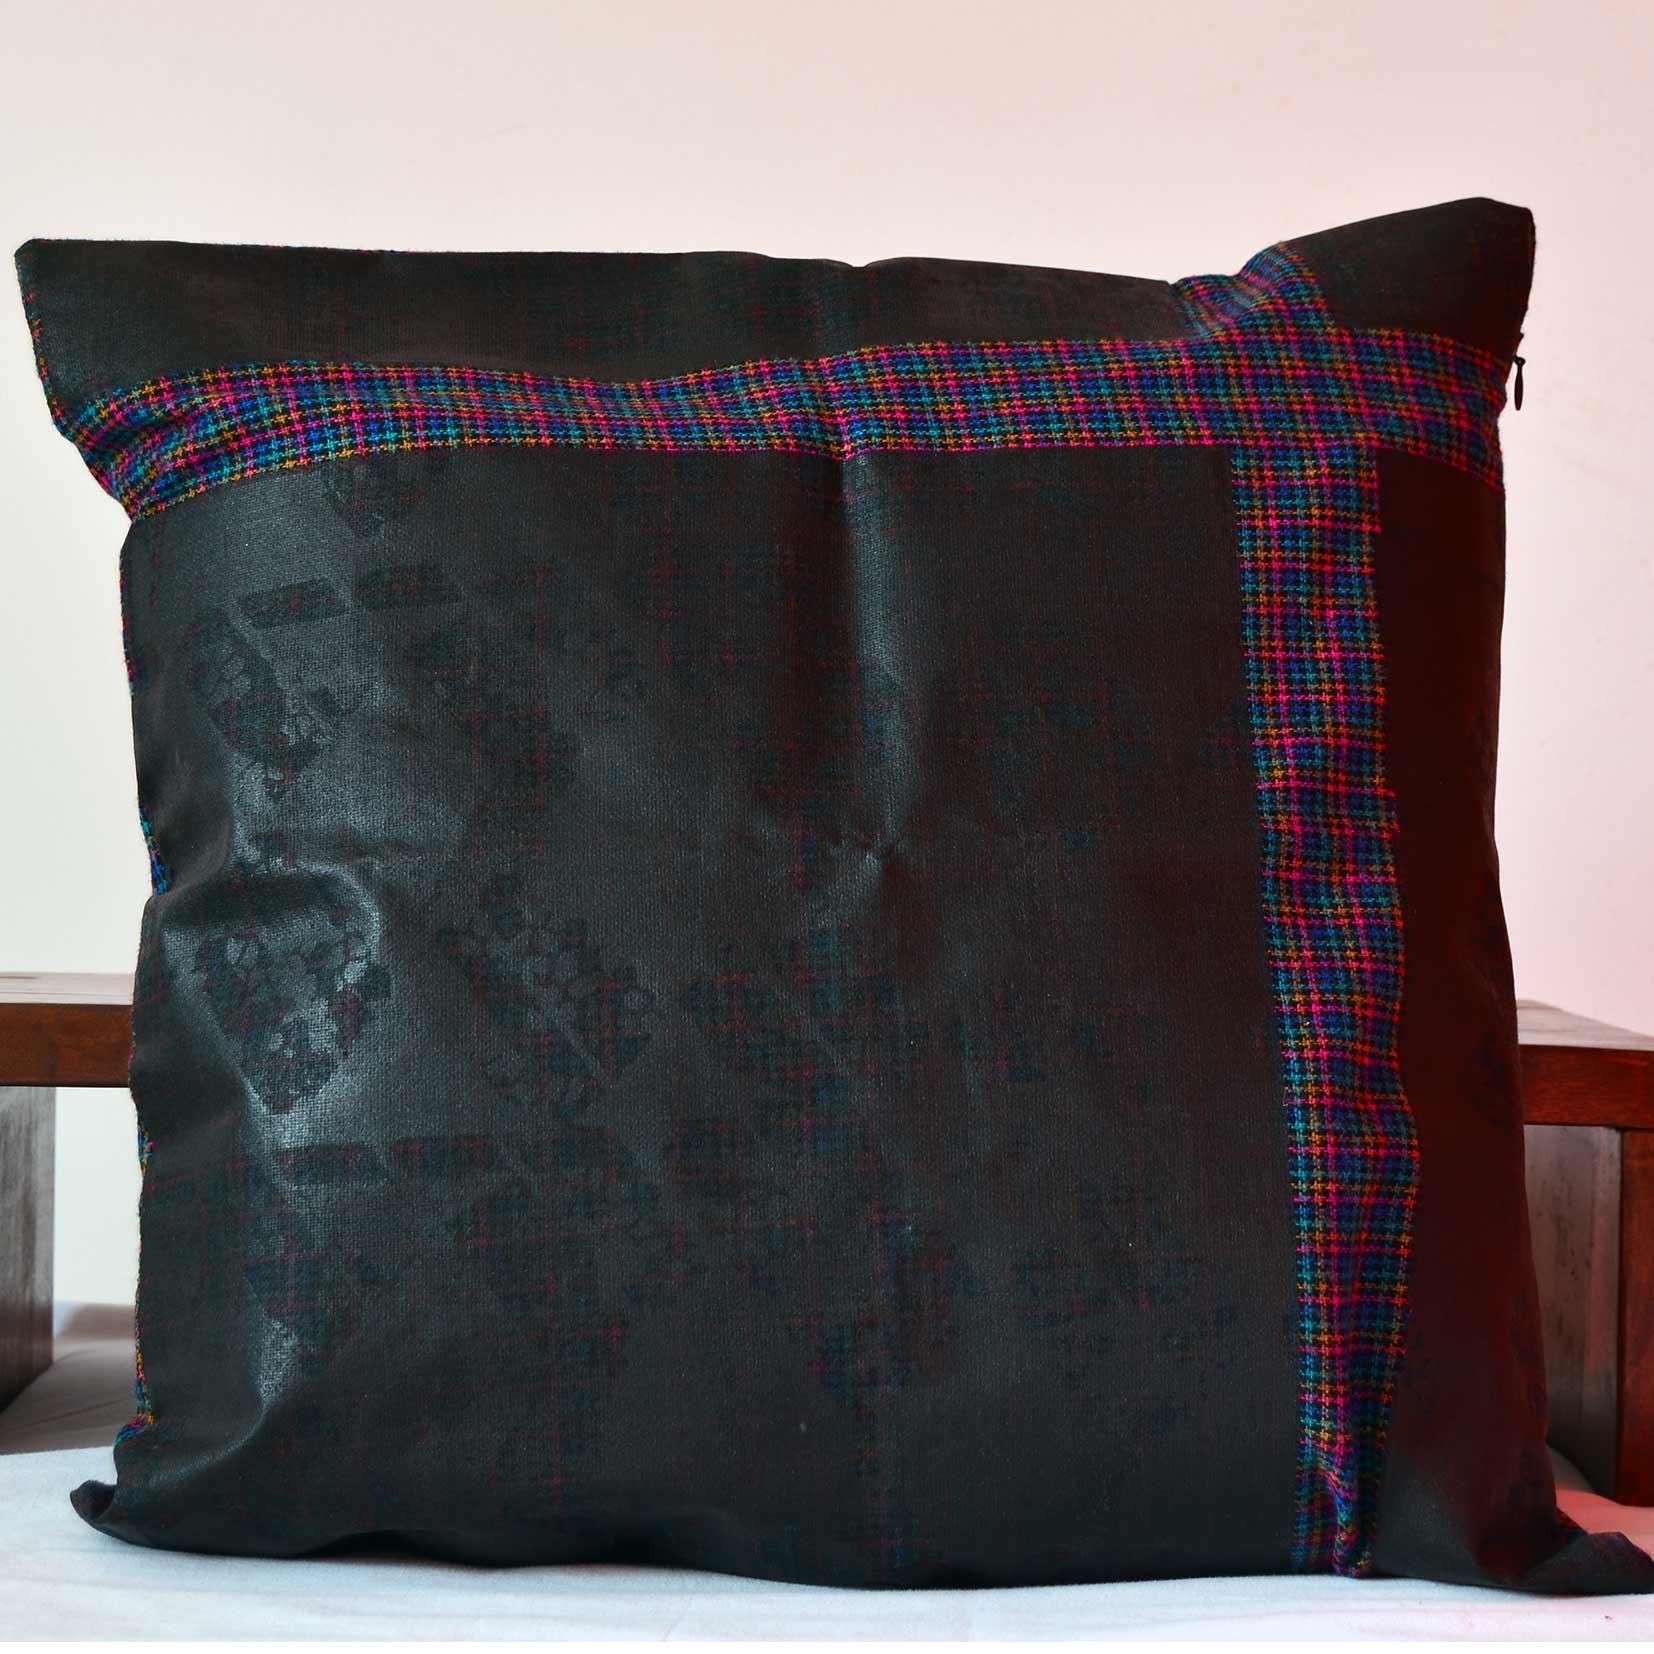 slowdesign & ameublement design textile motif ecossais